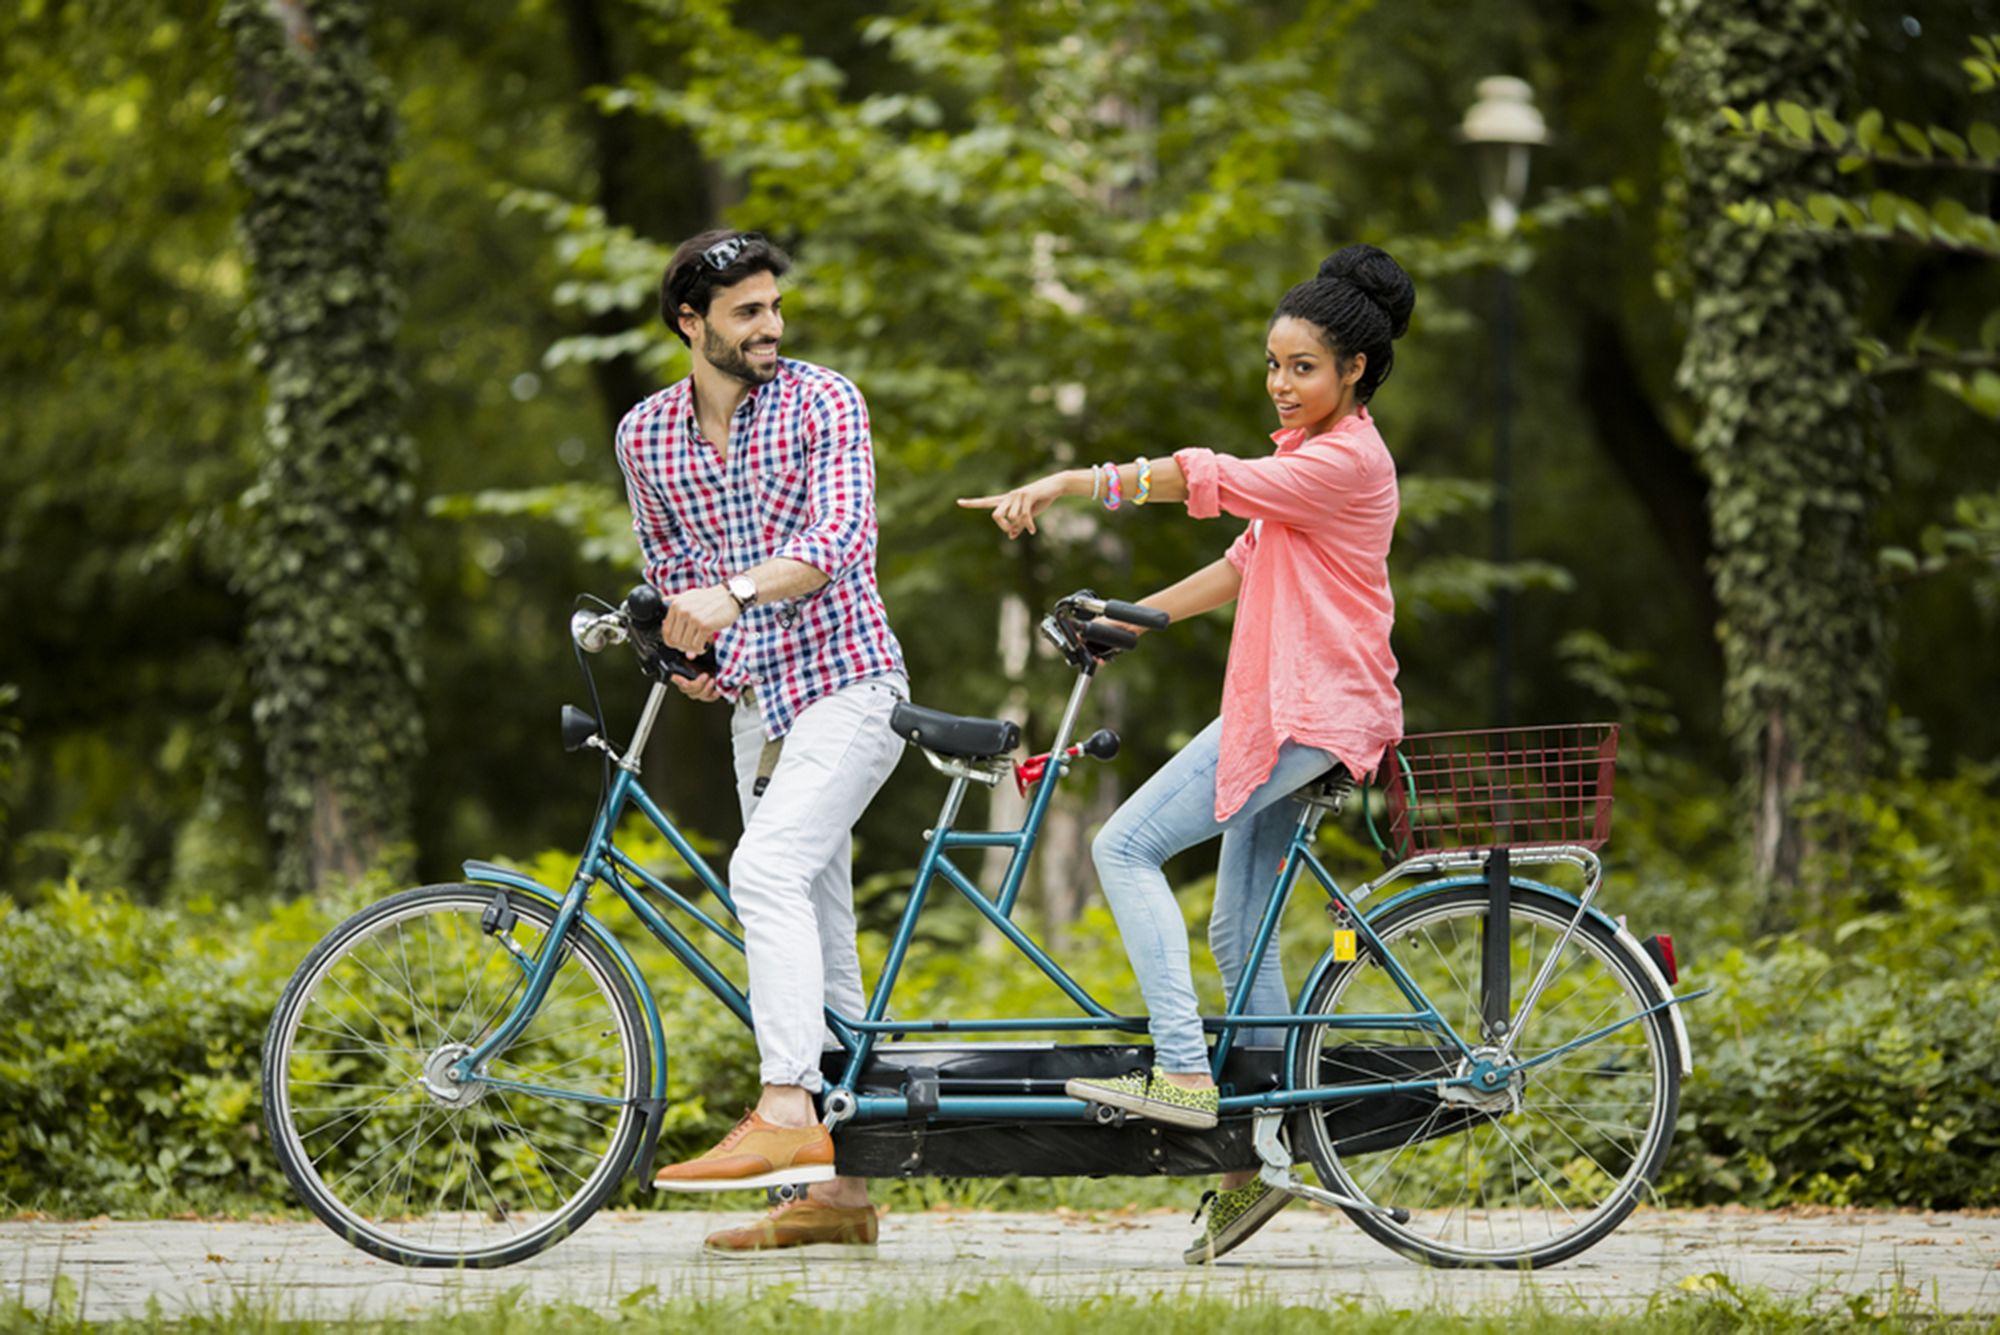 A couple rides a tandem bike